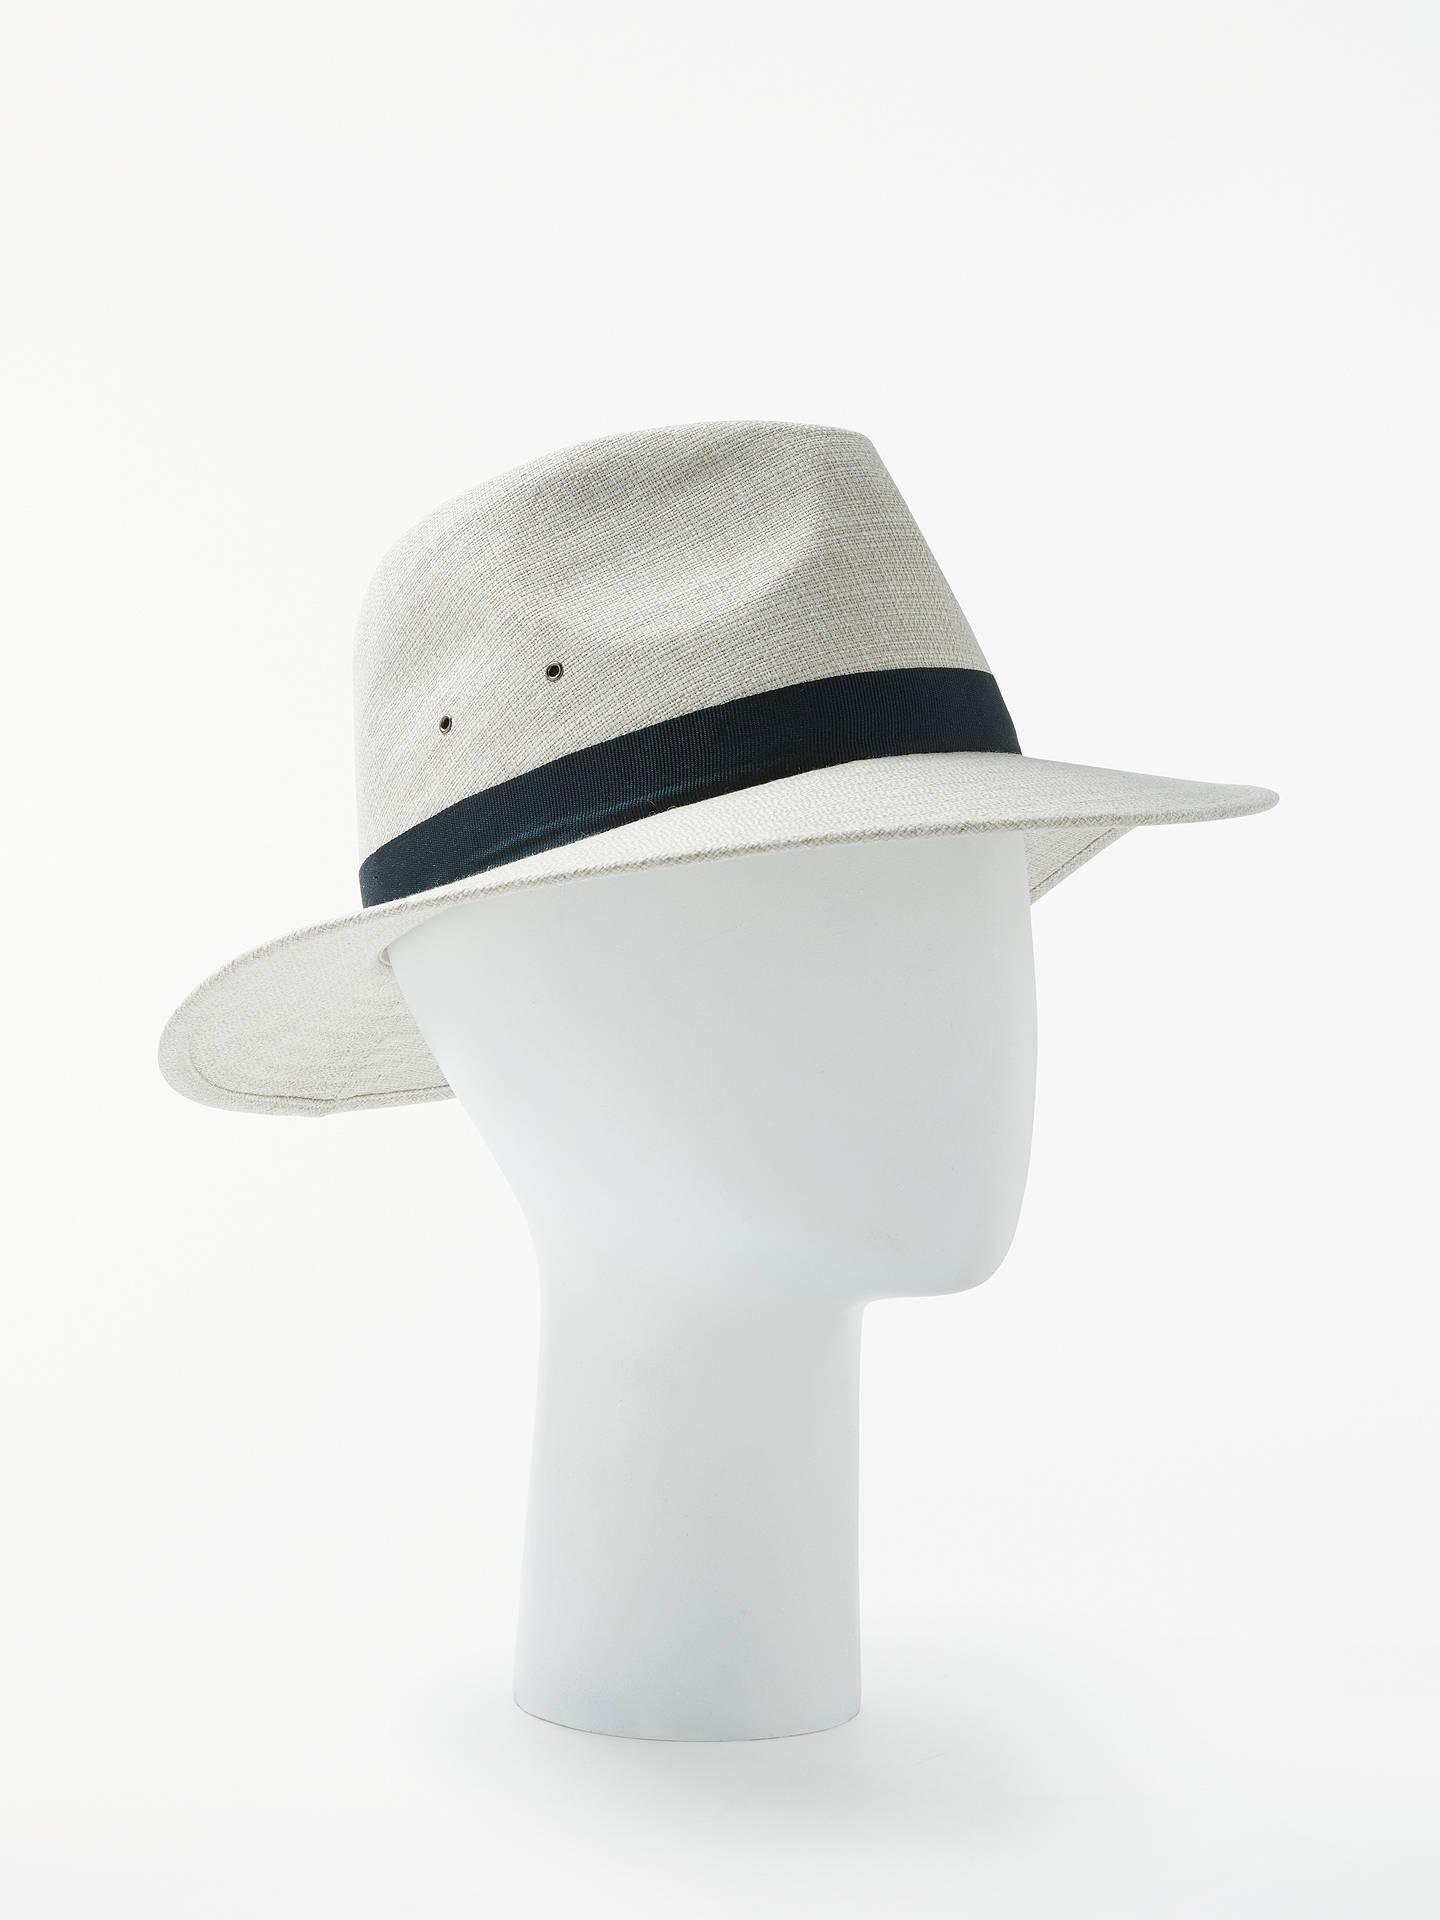 2fa113b98 John Lewis Ambassador Trilby Hat, Beige at John Lewis & Partners